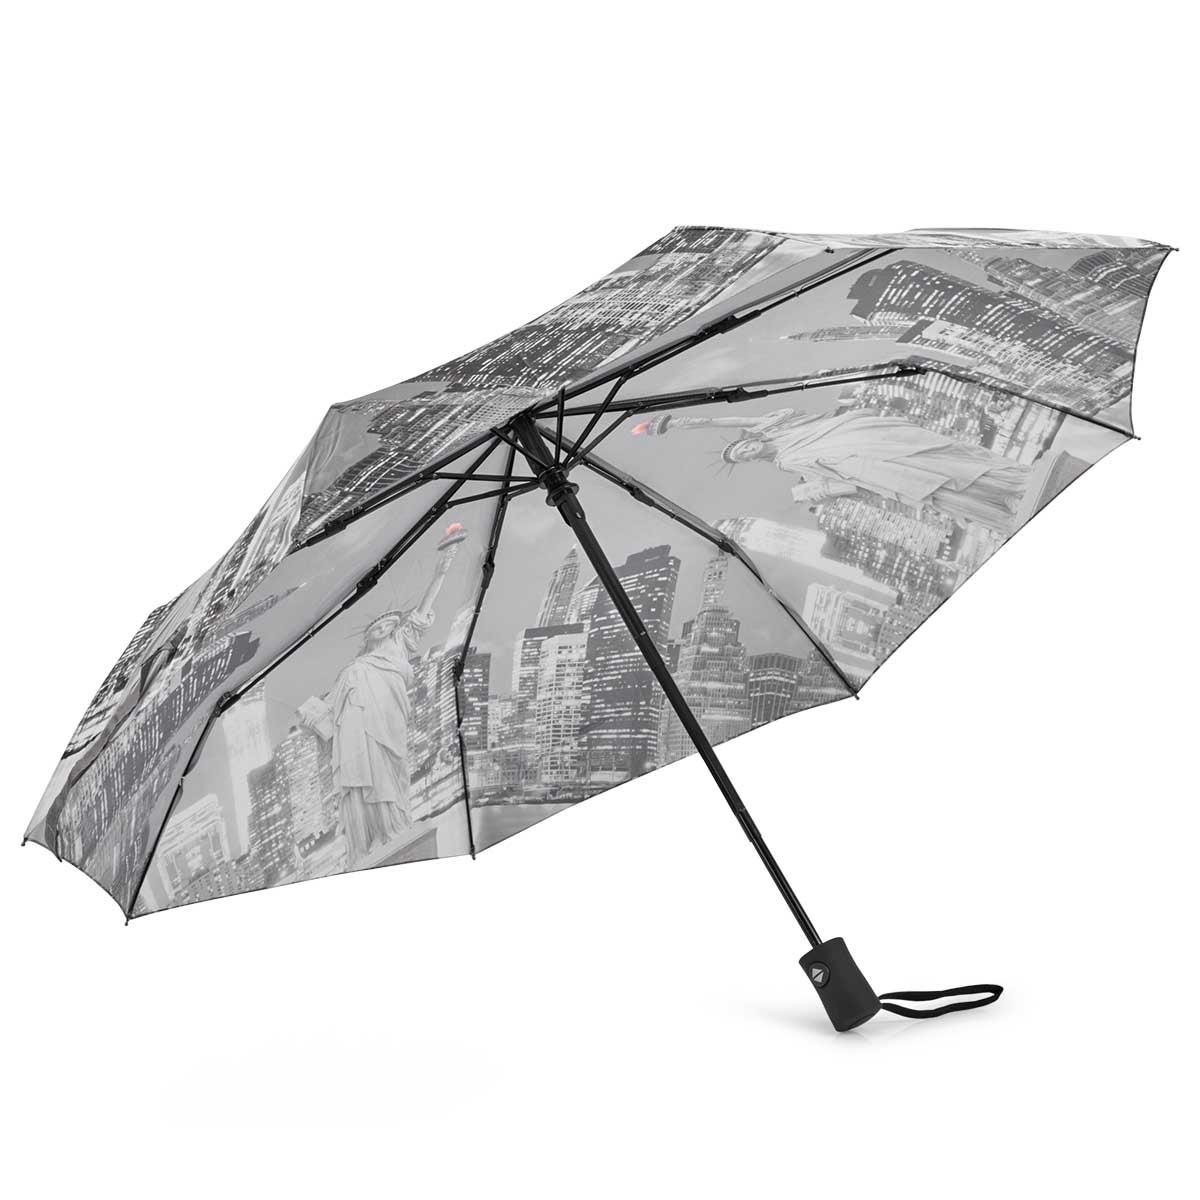 BelAmi CITY PRINT NEW YORK umbrellas